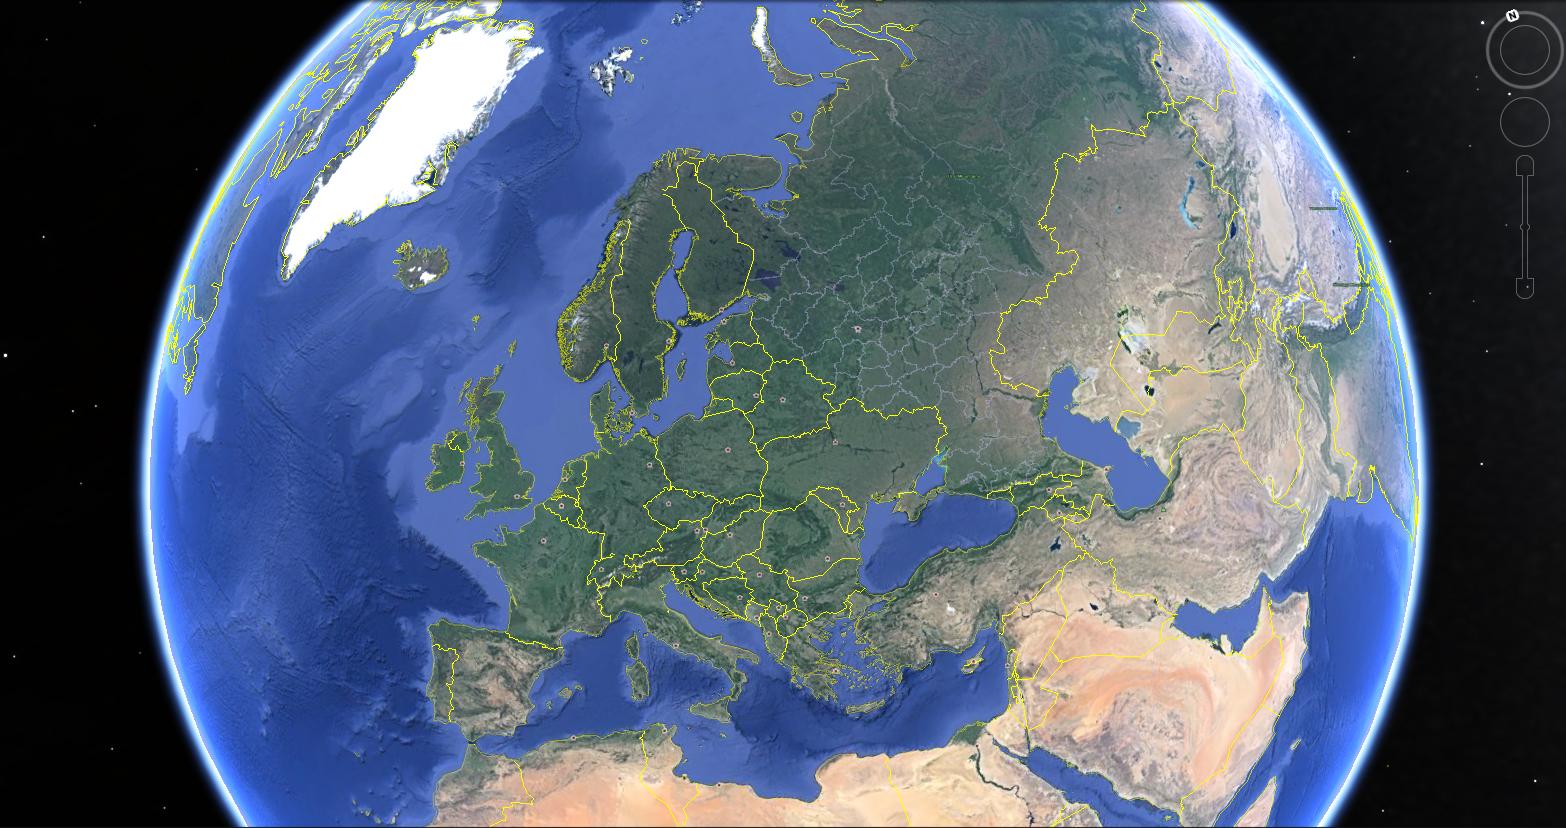 Google Earth View